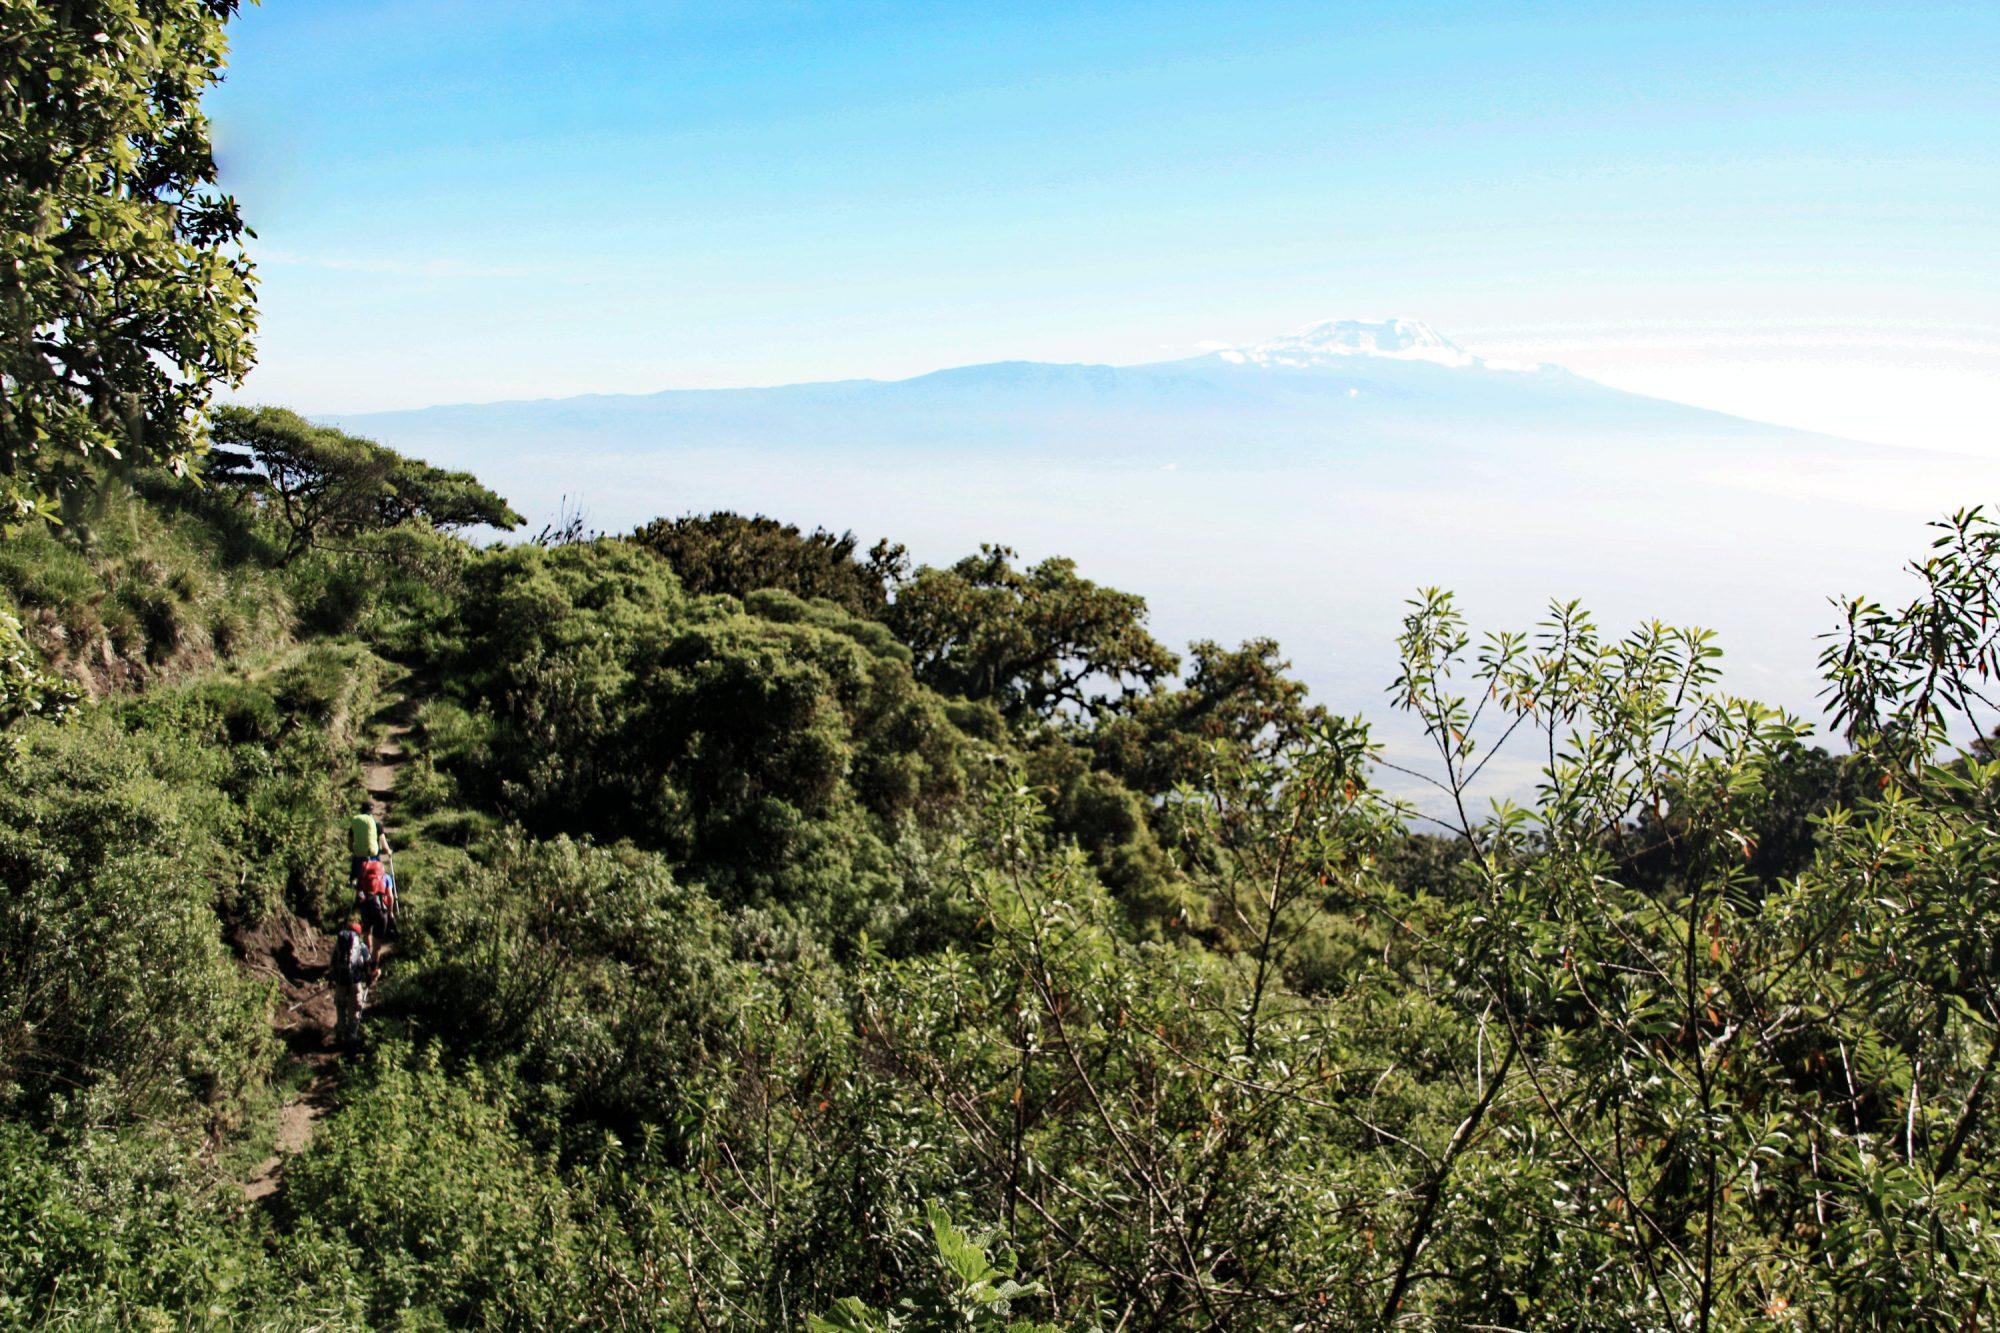 Wandern am Mount Meru mit Kilimandscharo Blick, Regenwald, Arusha Nationalpark, Tansania, Afrika